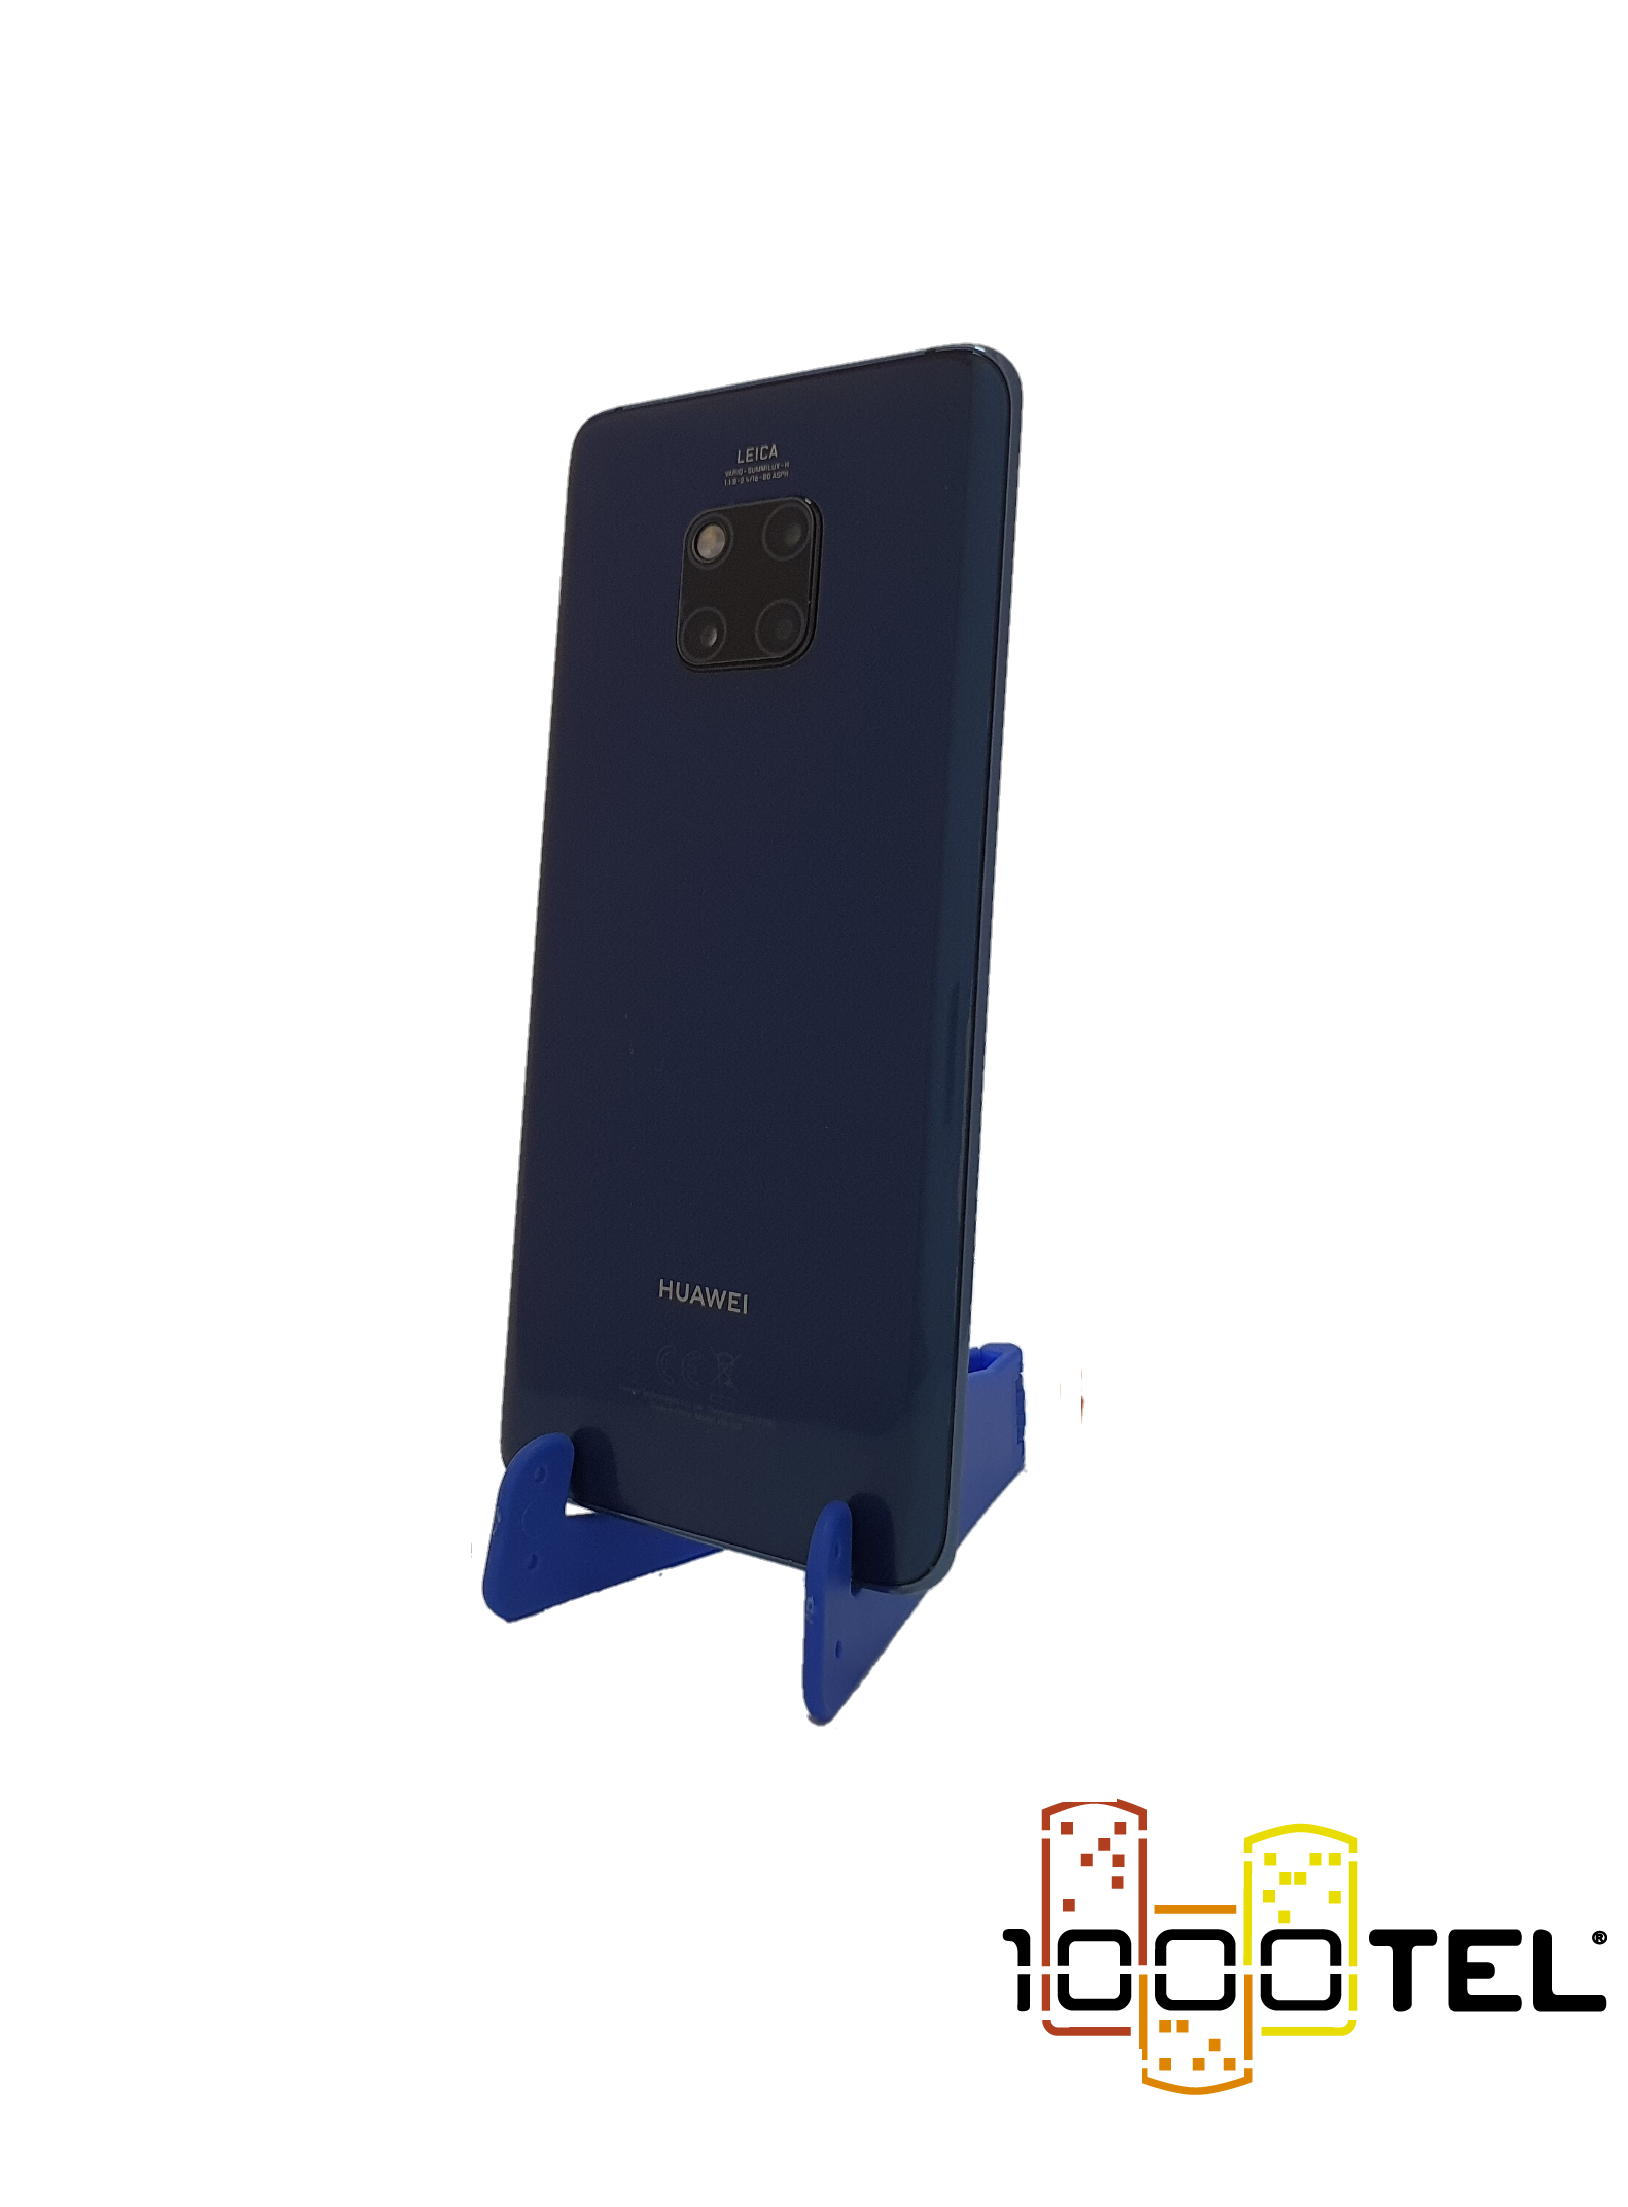 Huawei Mate 20 Pro #4